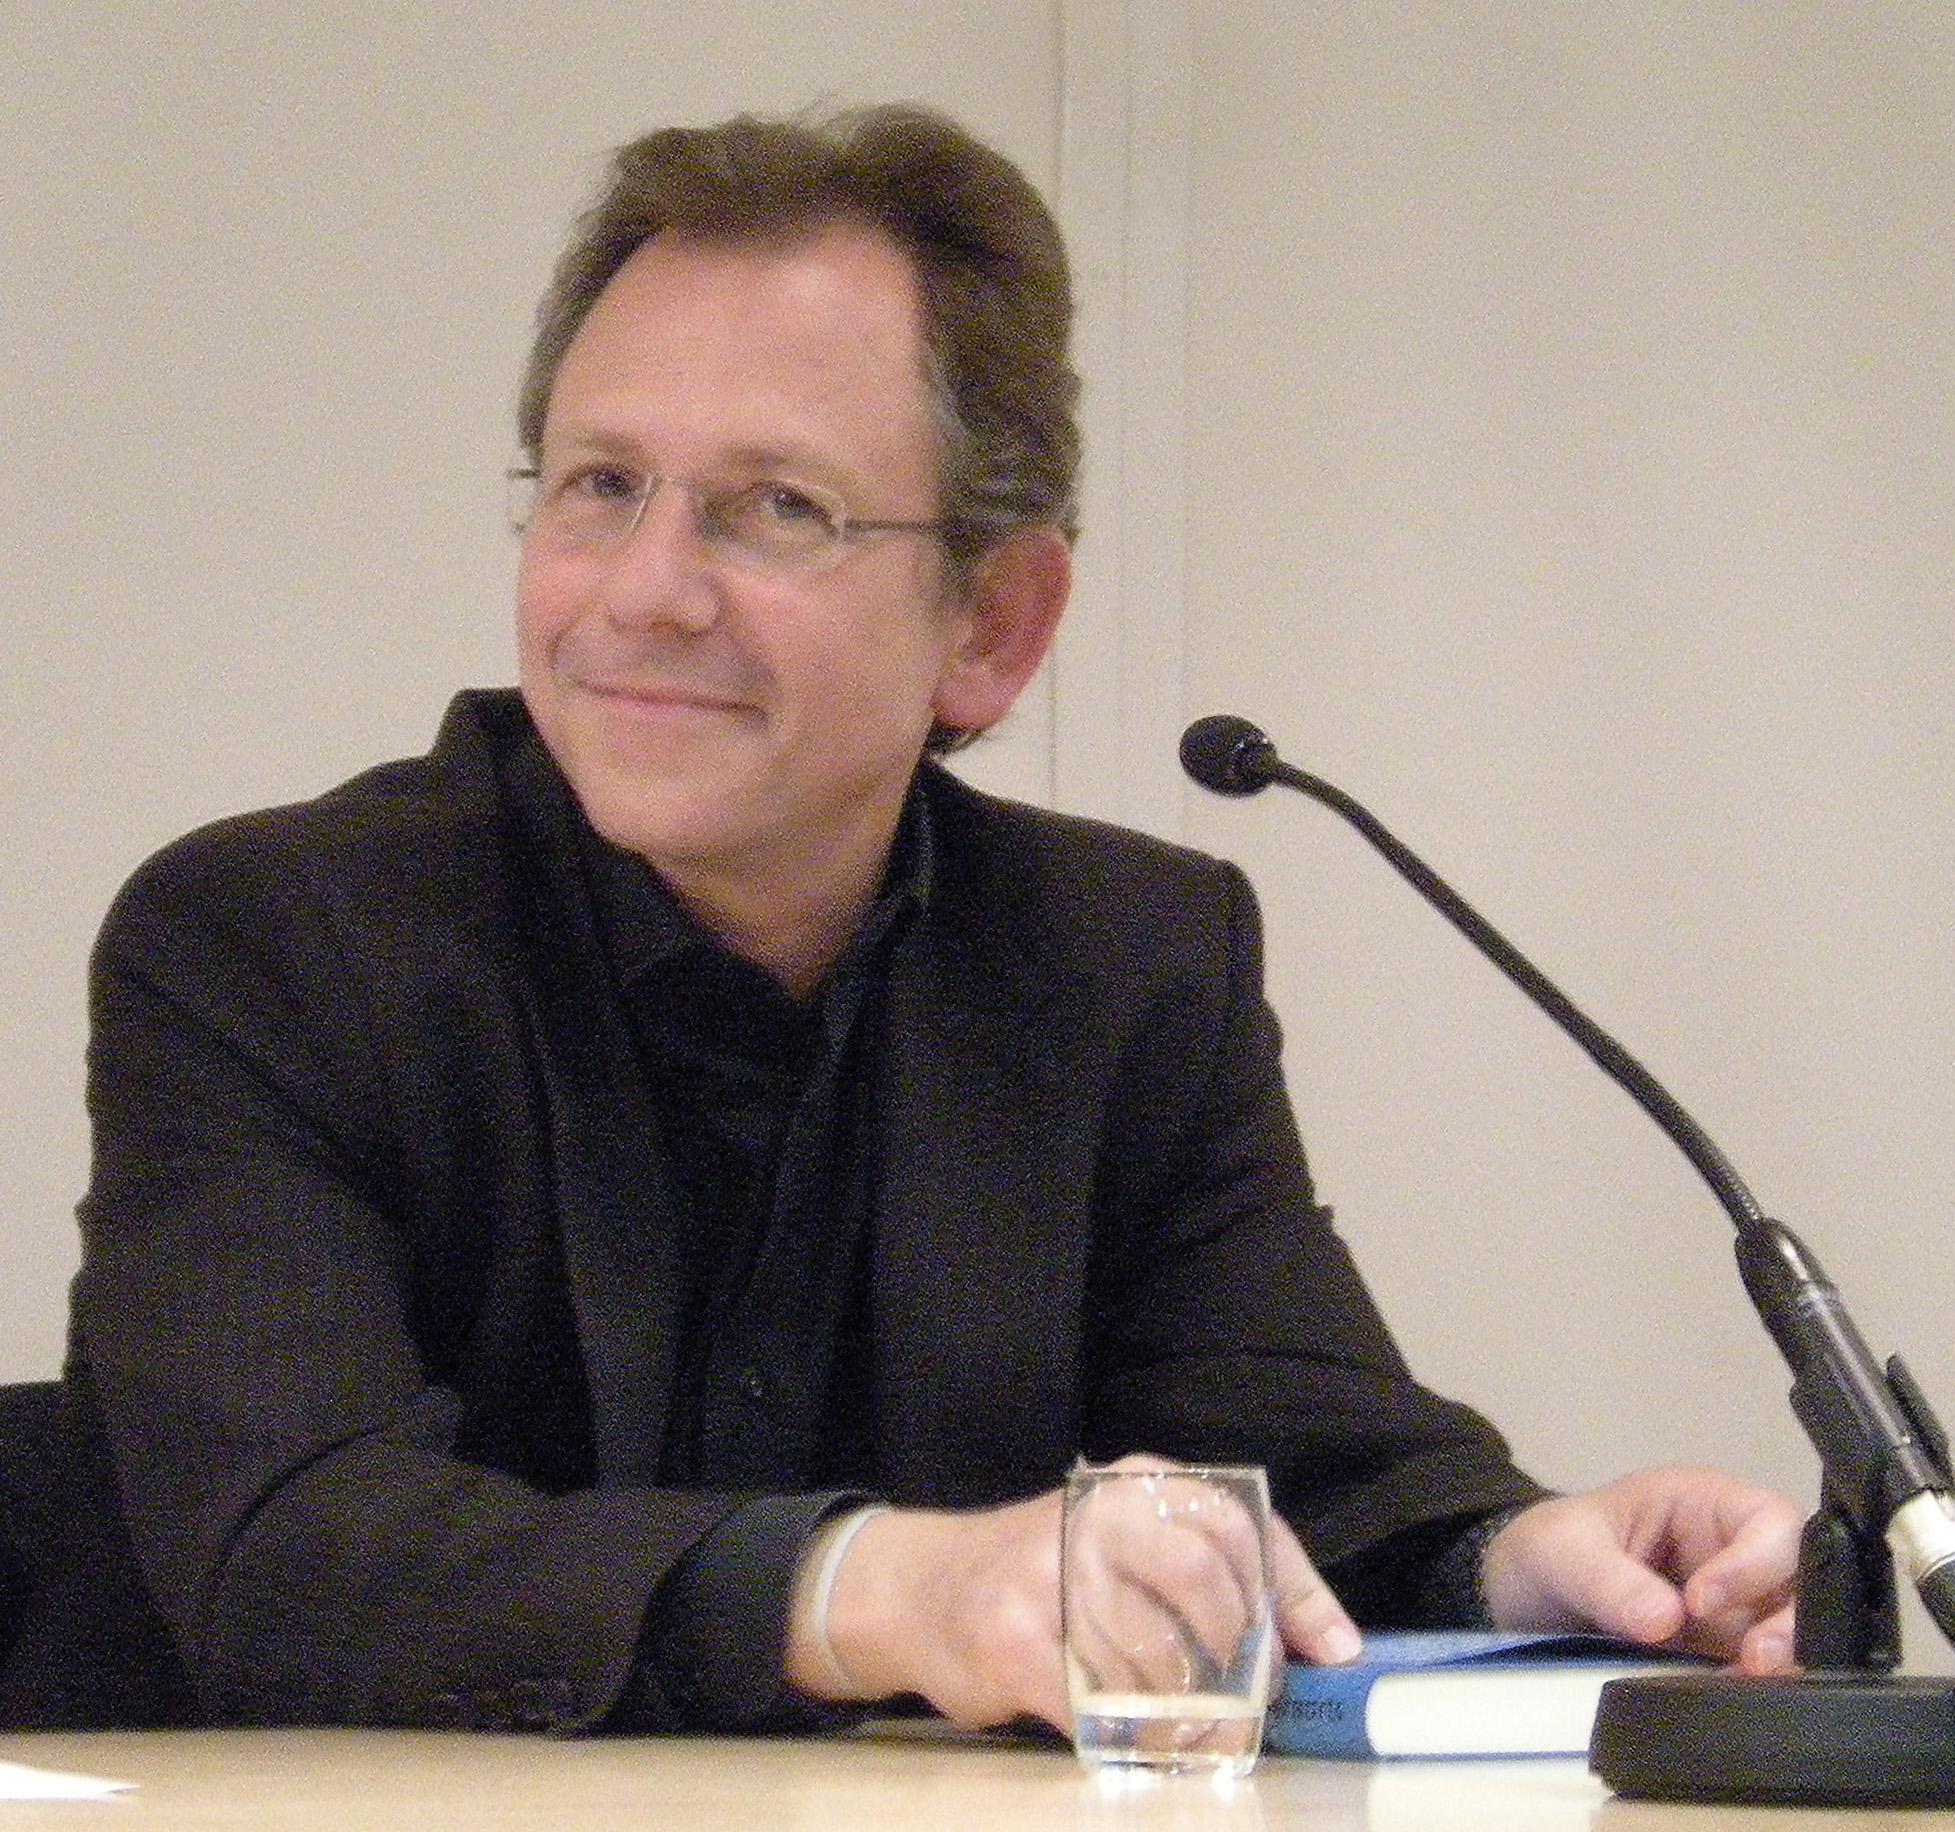 Doron Rabinovici presenting his novel 'Andernorts' in Vienna, on 16 September 2010.